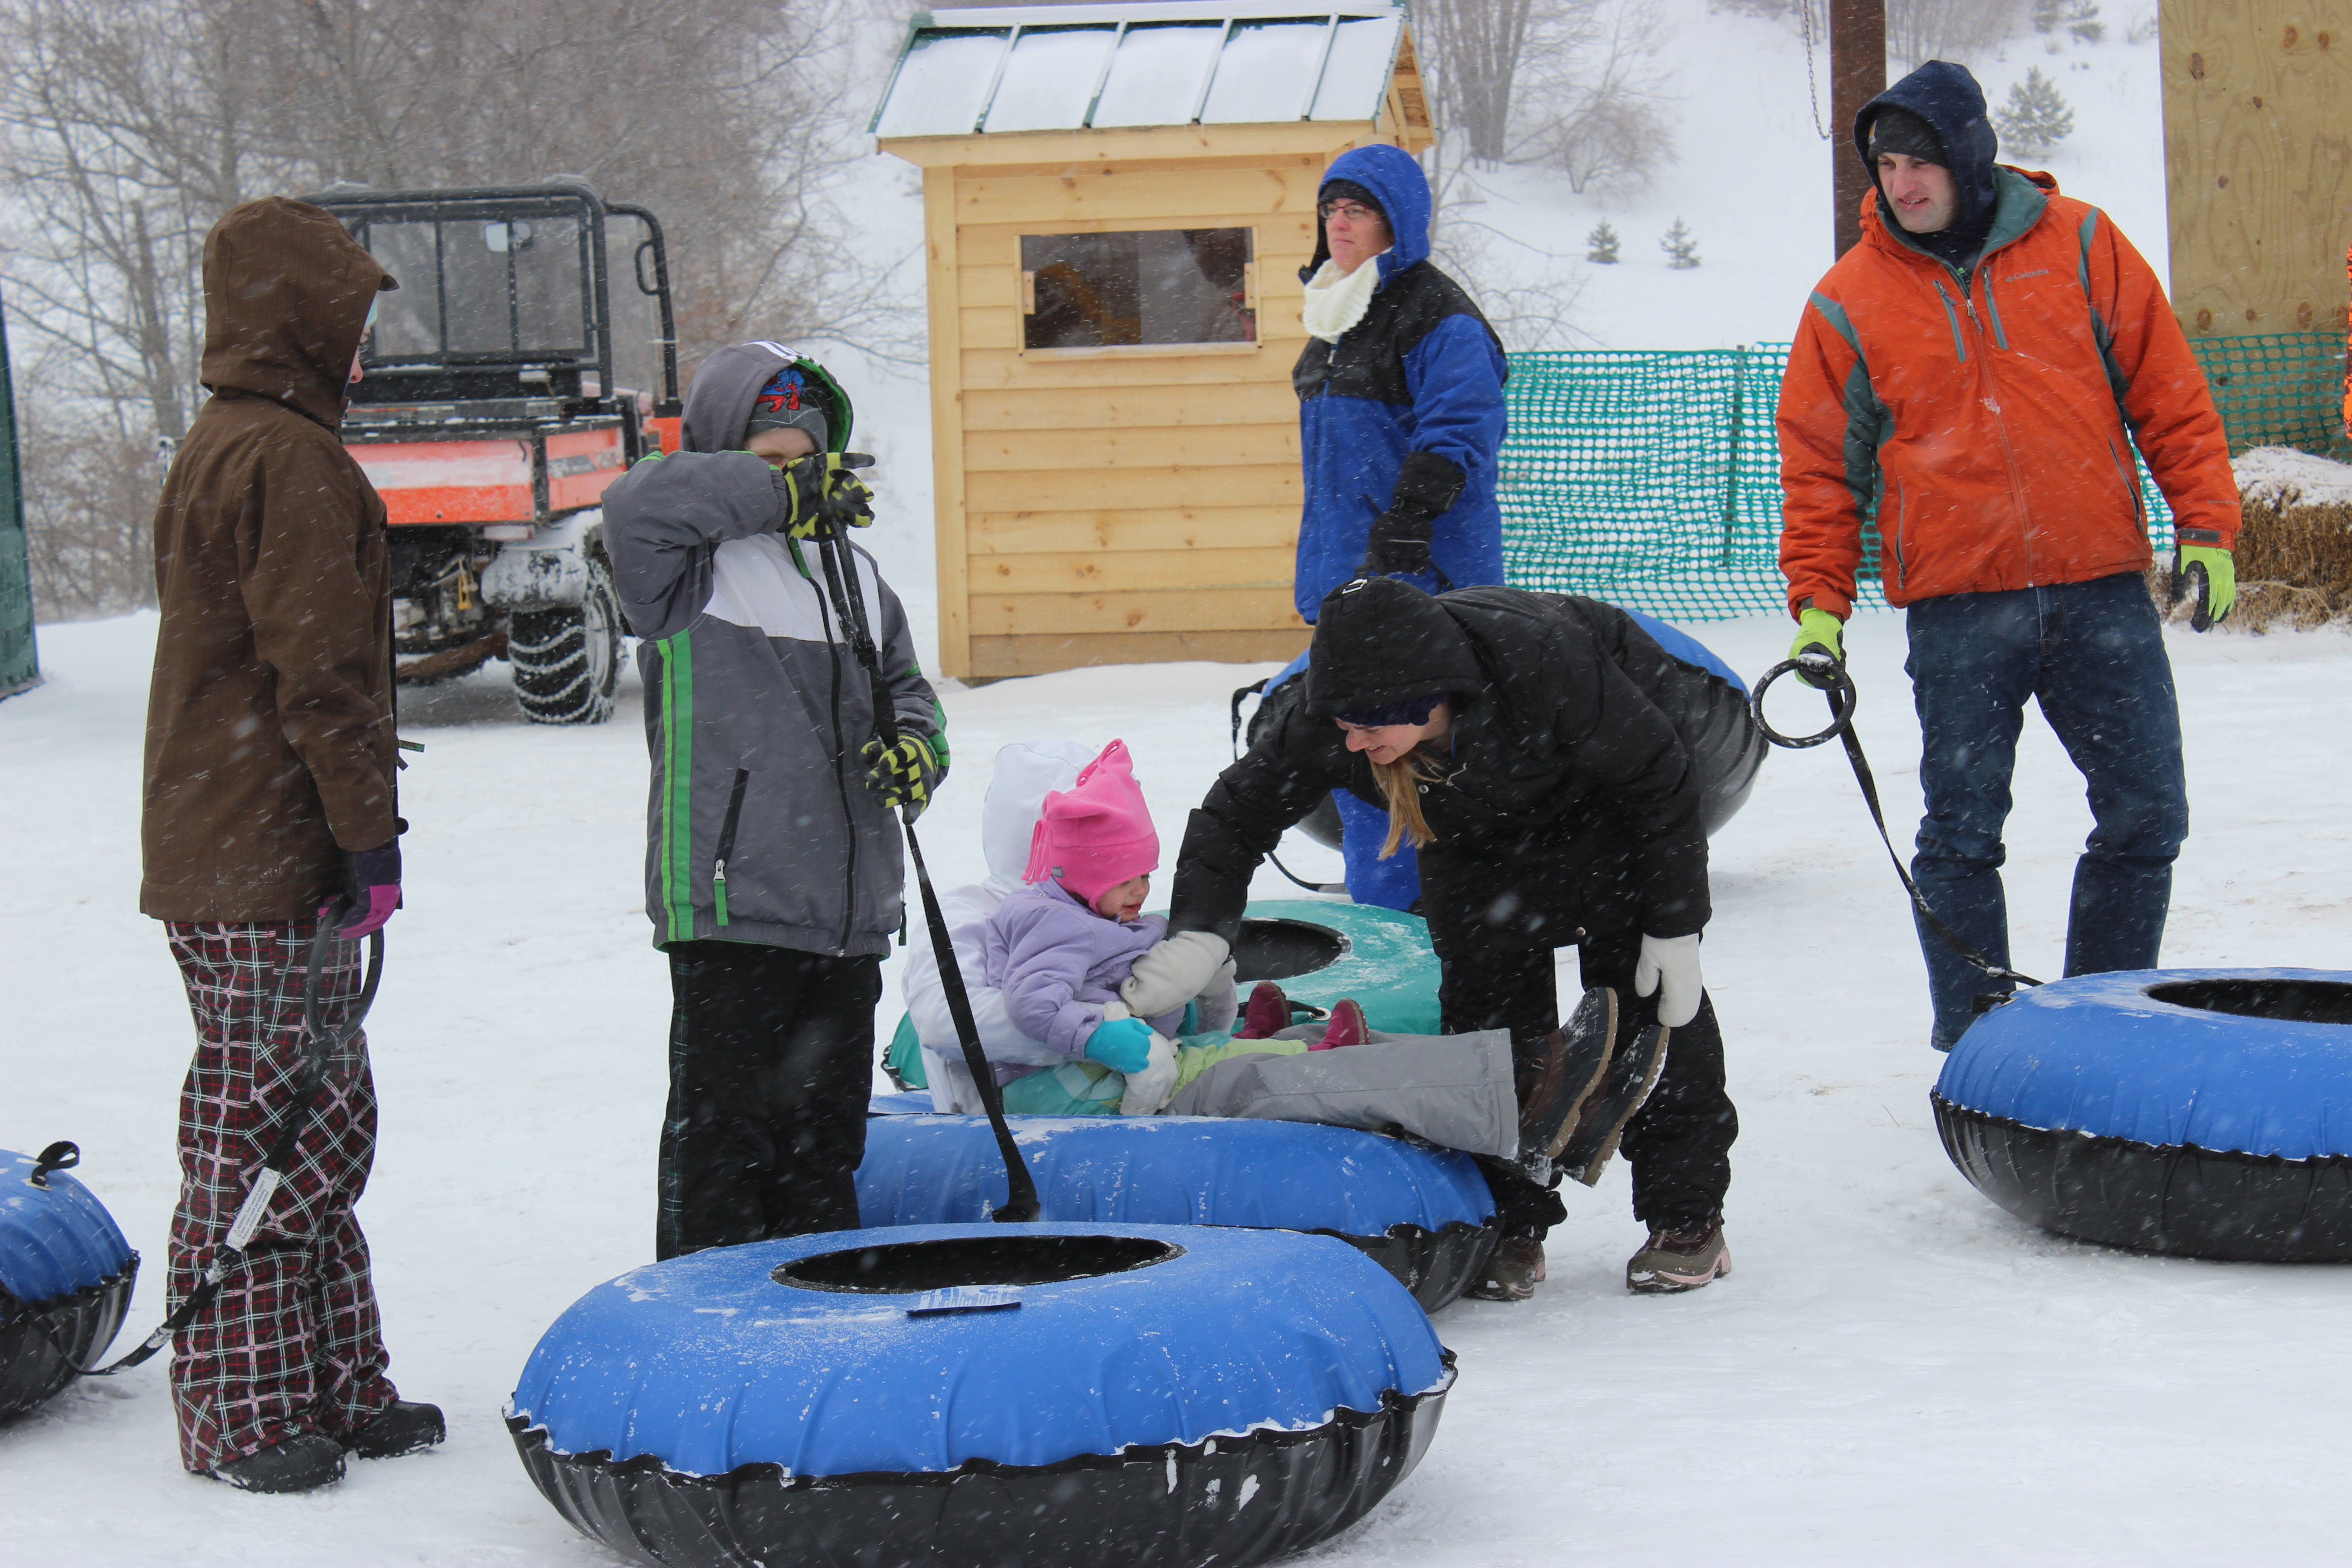 Winter Carnival Tubing